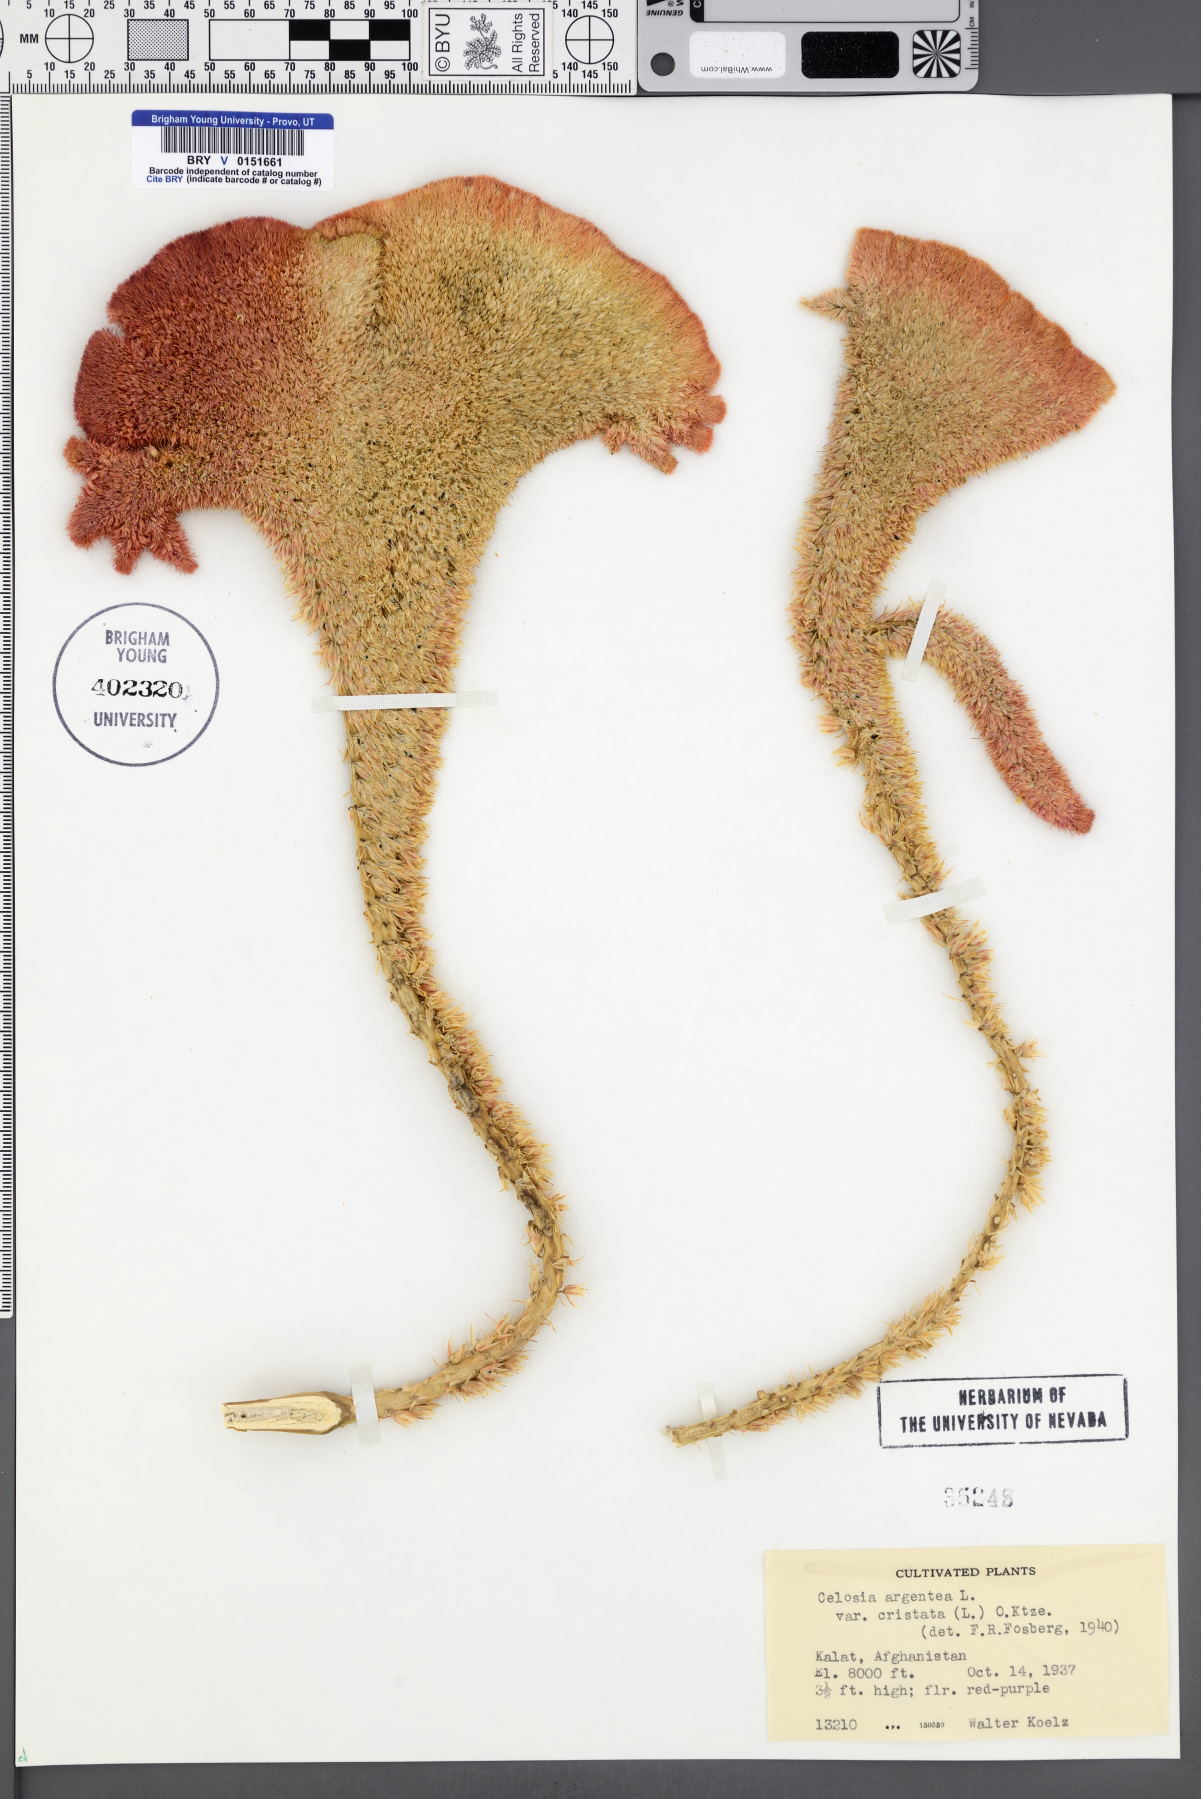 Celosia argentea var. cristata image